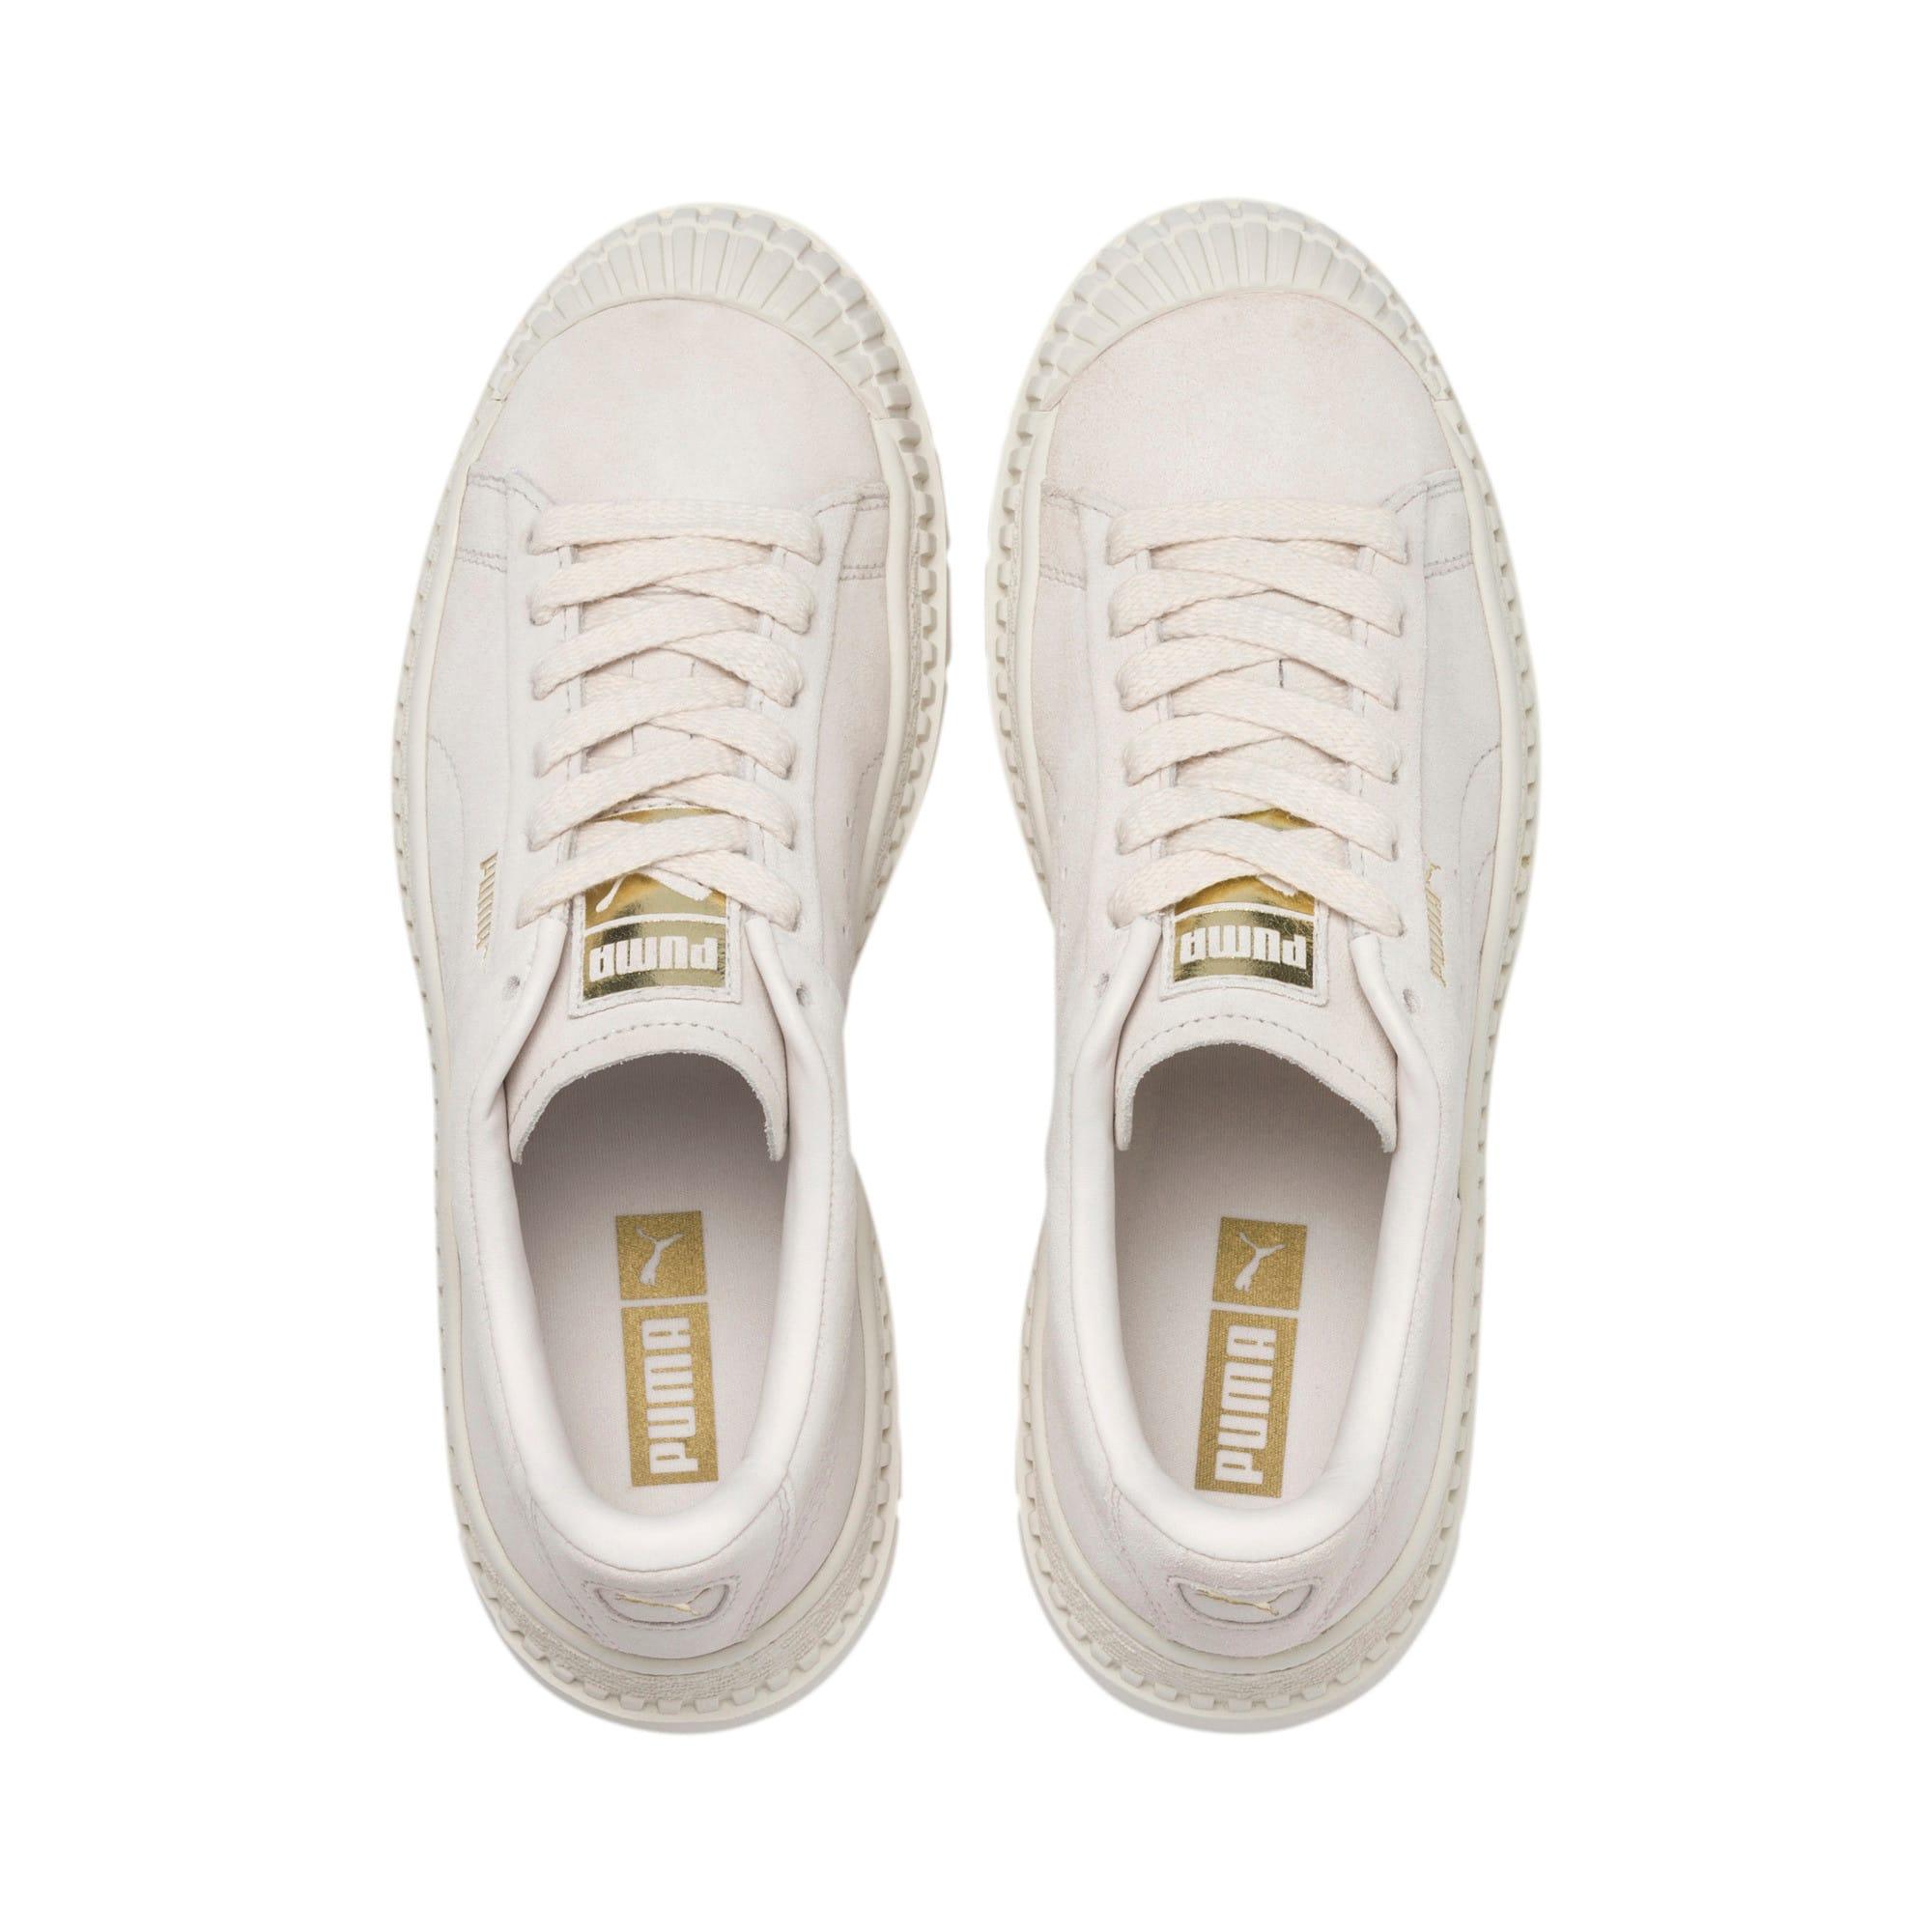 Thumbnail 7 of Utility Suede Women's Sneakers, Pastel Parchment, medium